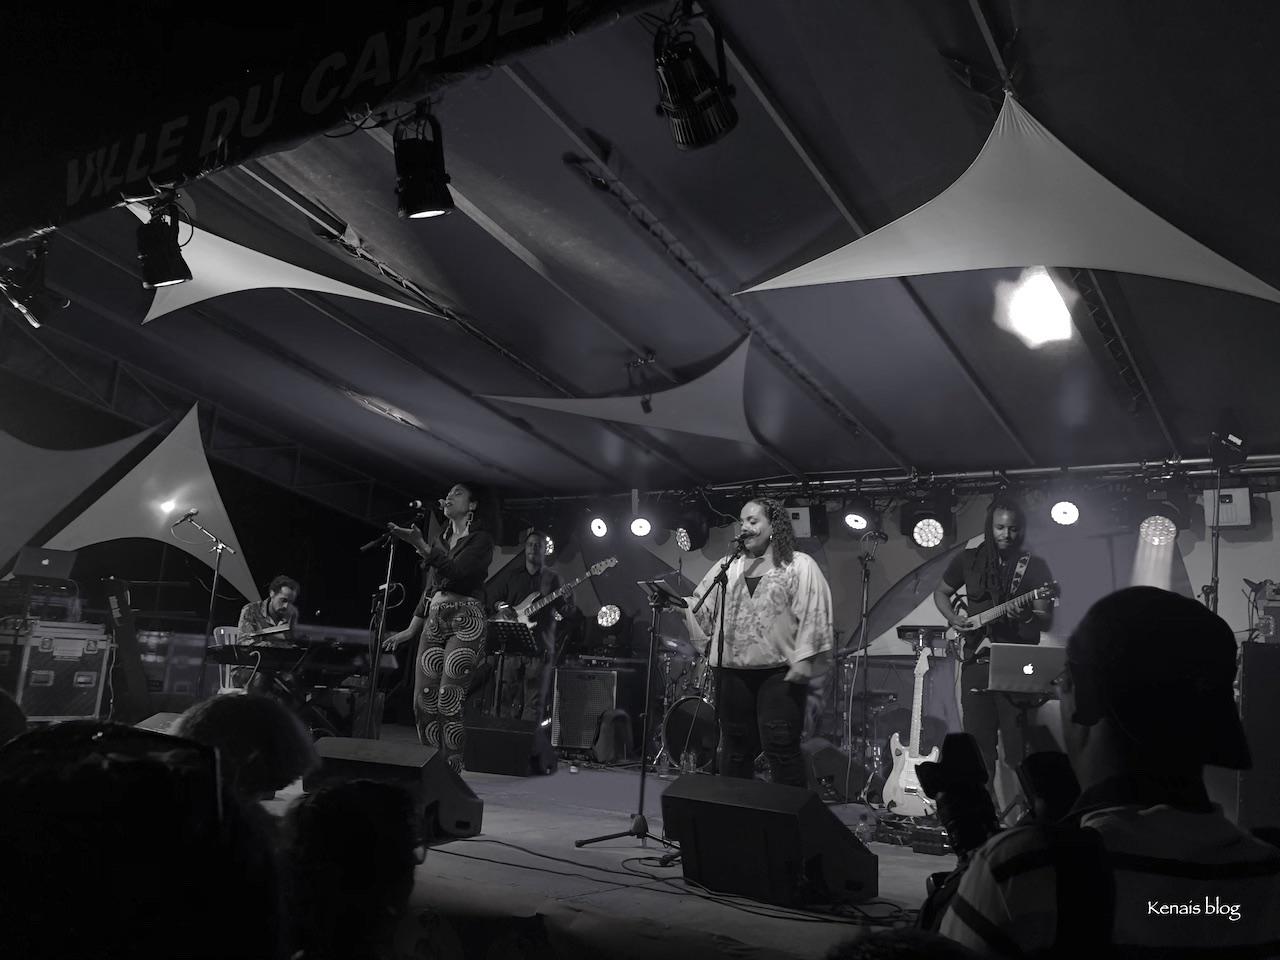 photo-tanya-saint-val-music-on-the-beach-martinique-leton-kenais-blog